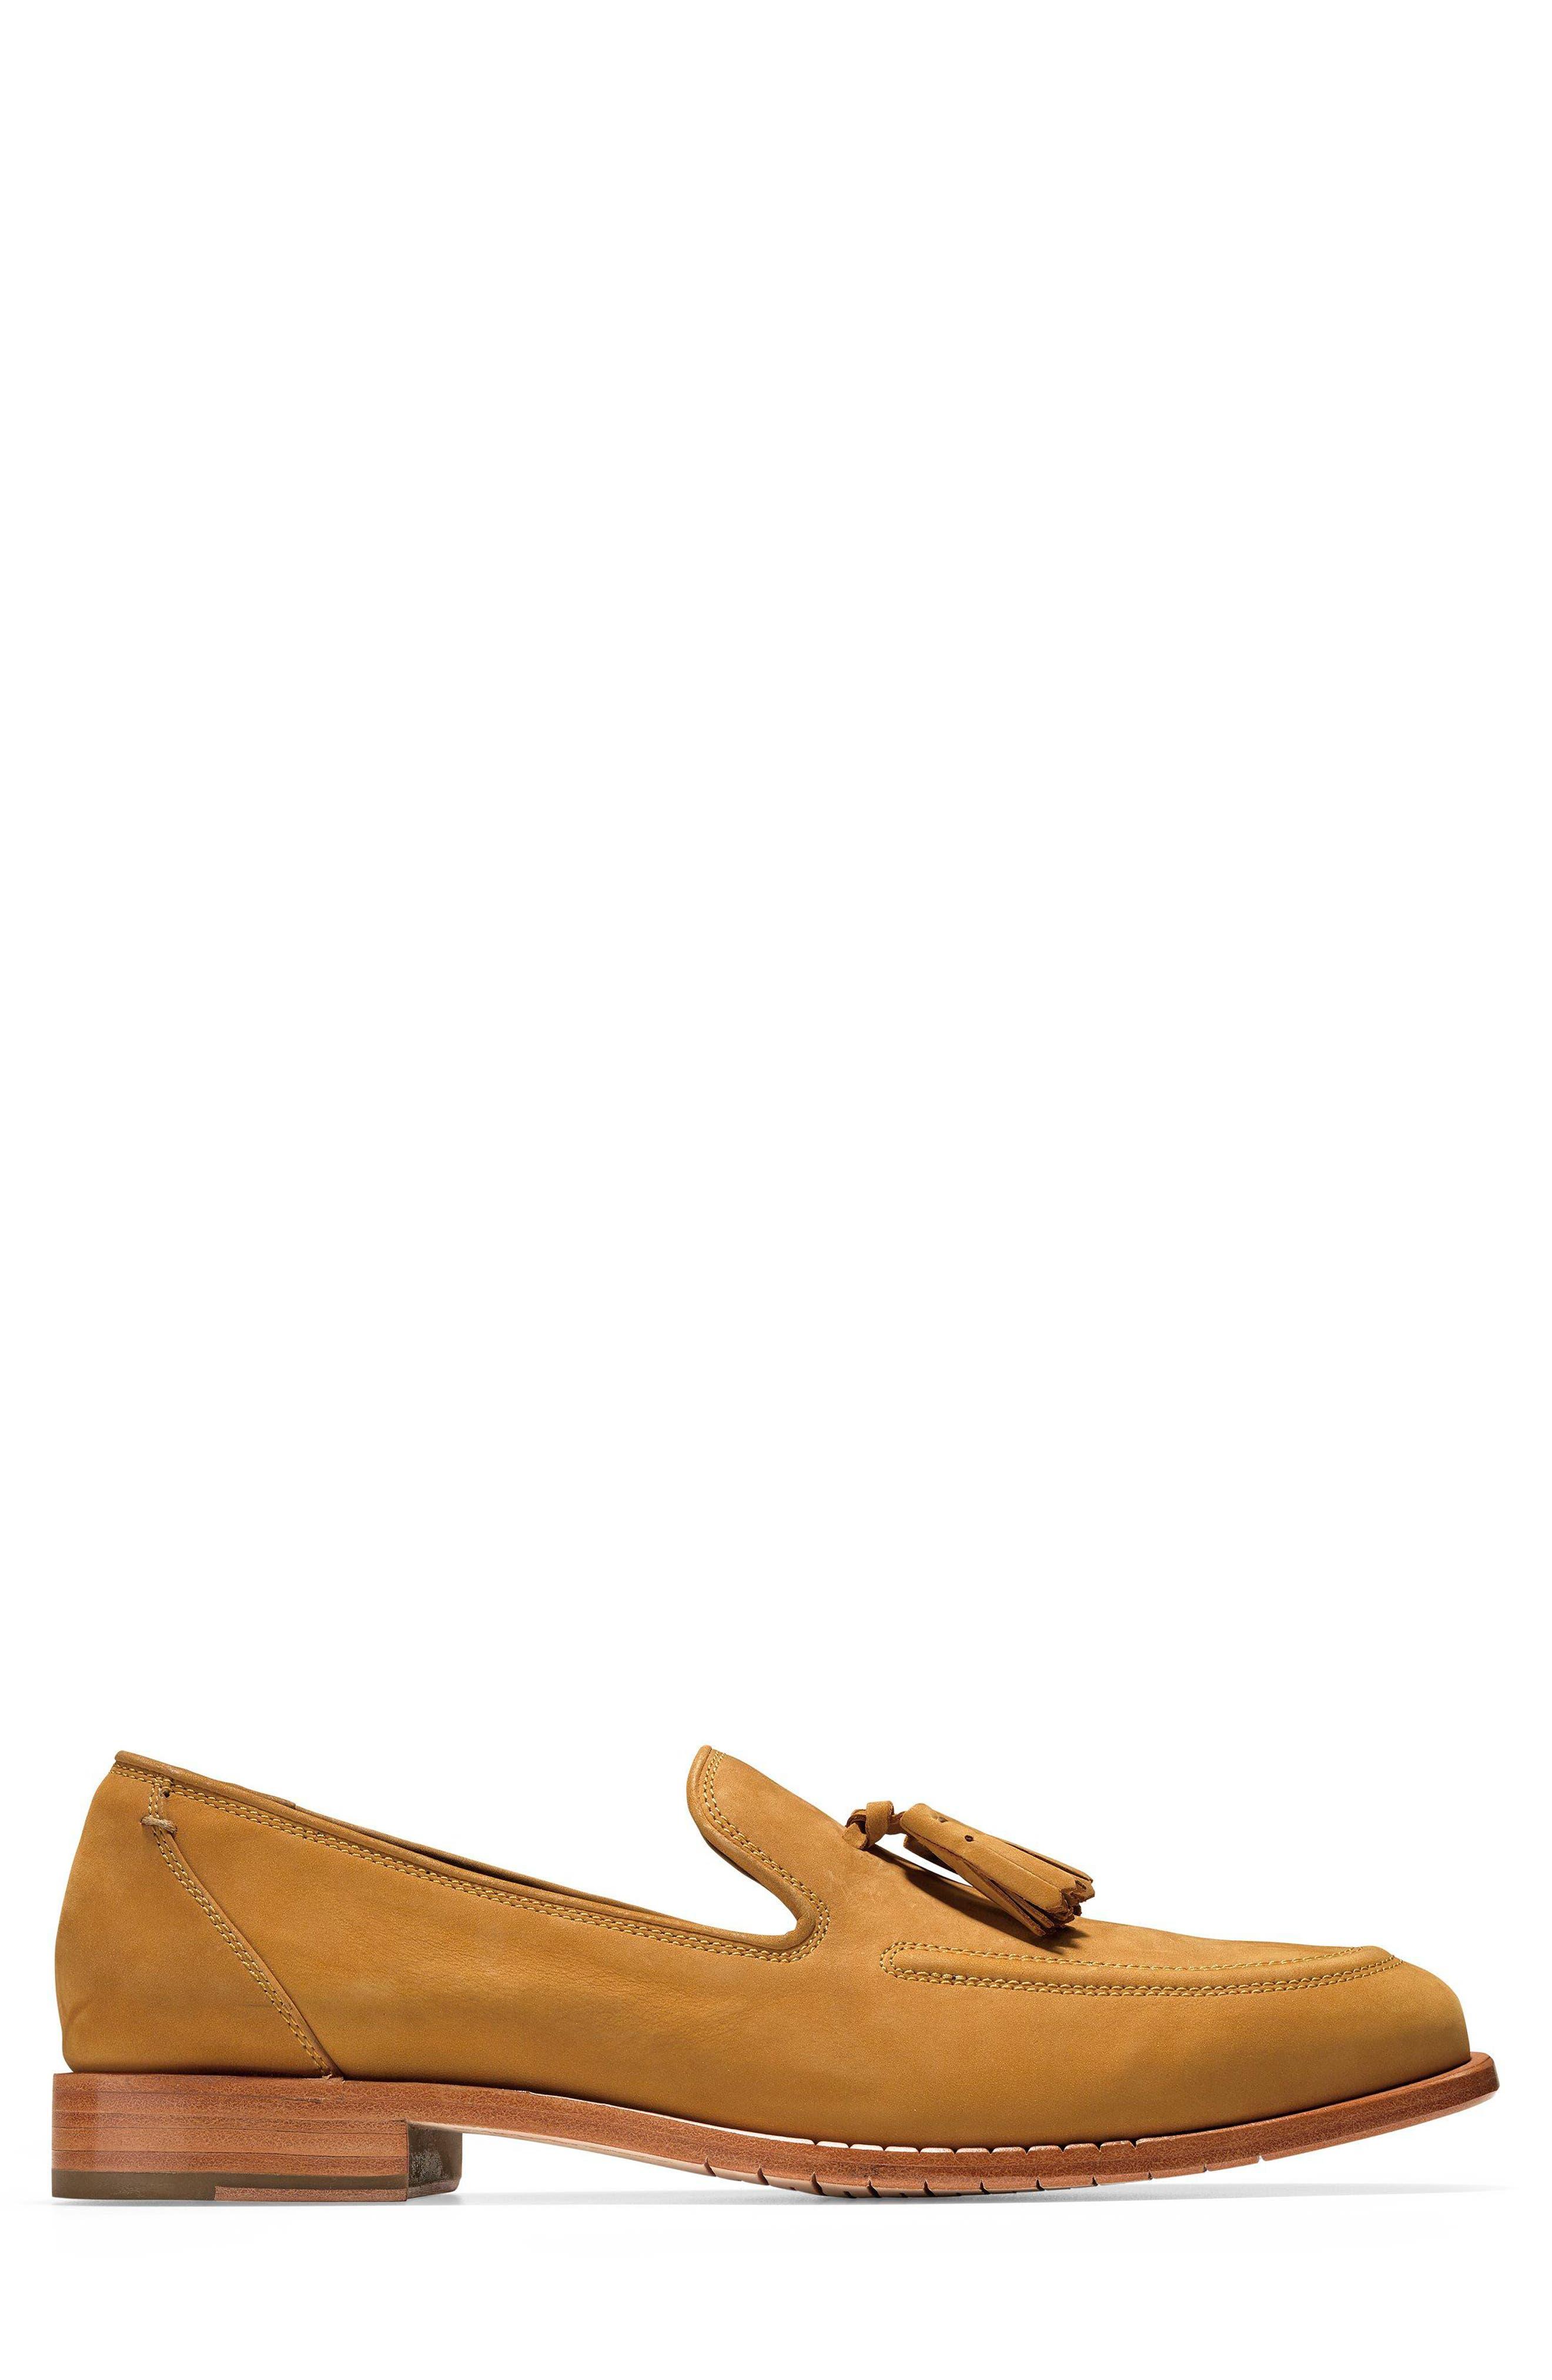 Washington Grand Tassel Loafer,                             Alternate thumbnail 10, color,